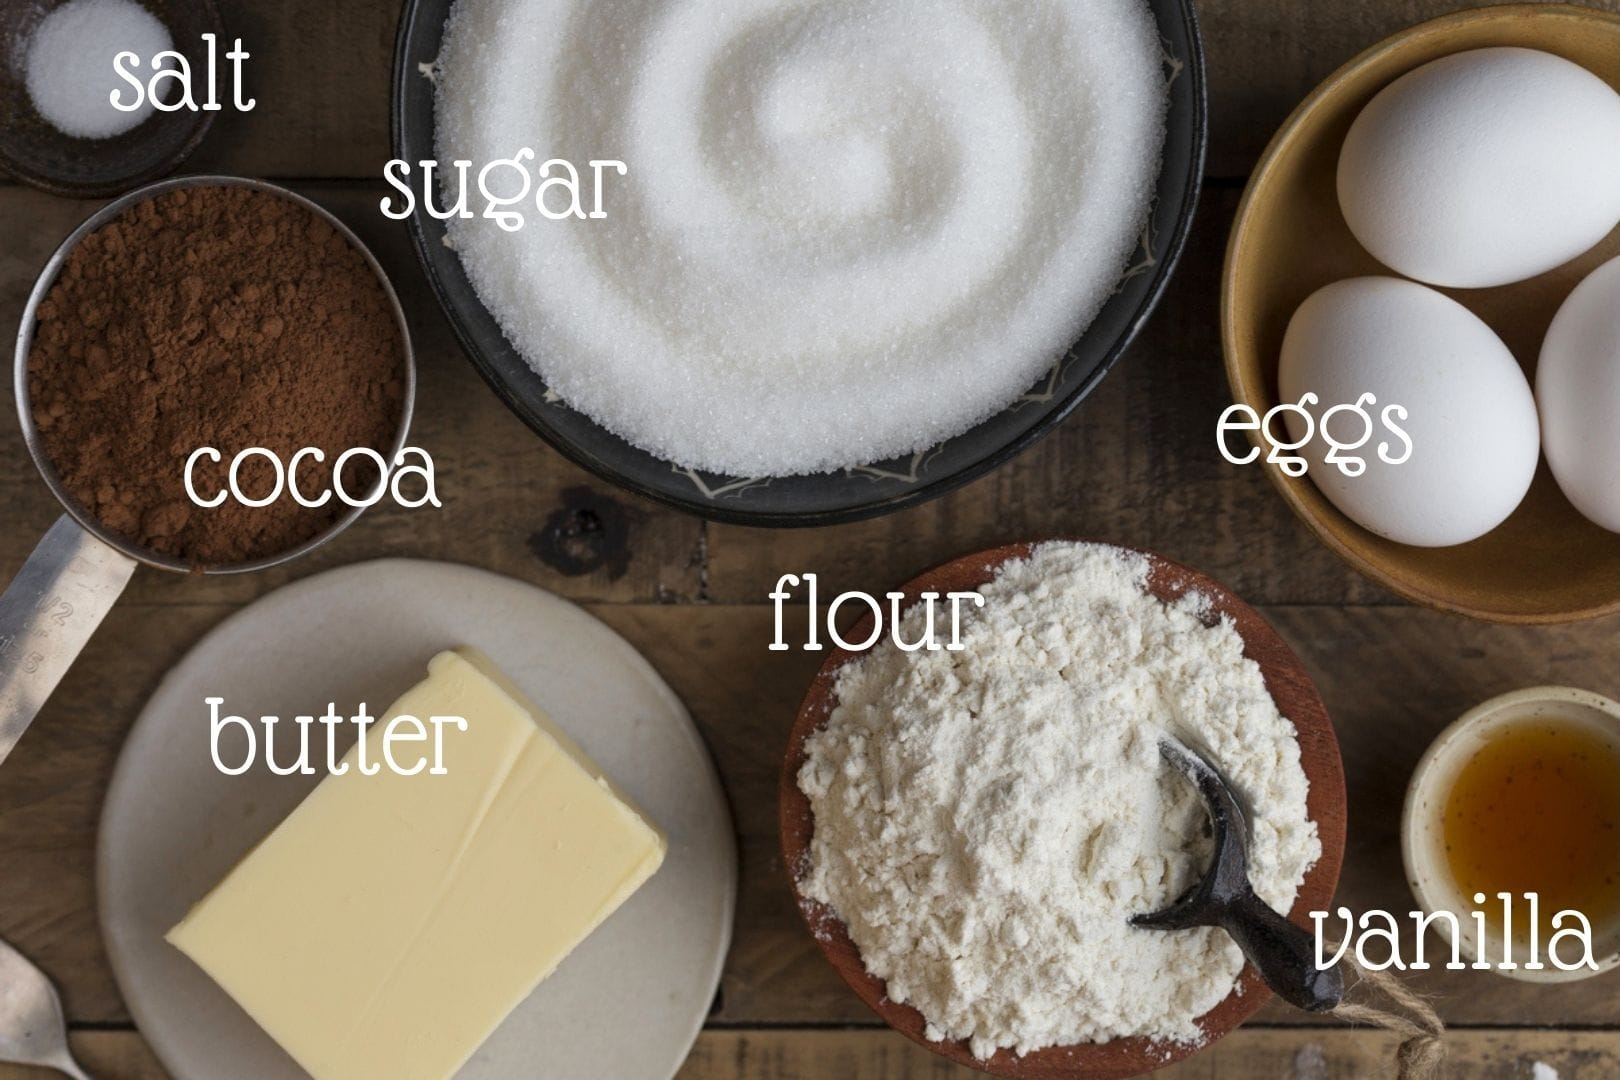 ingredients needed to make kladdkaka.